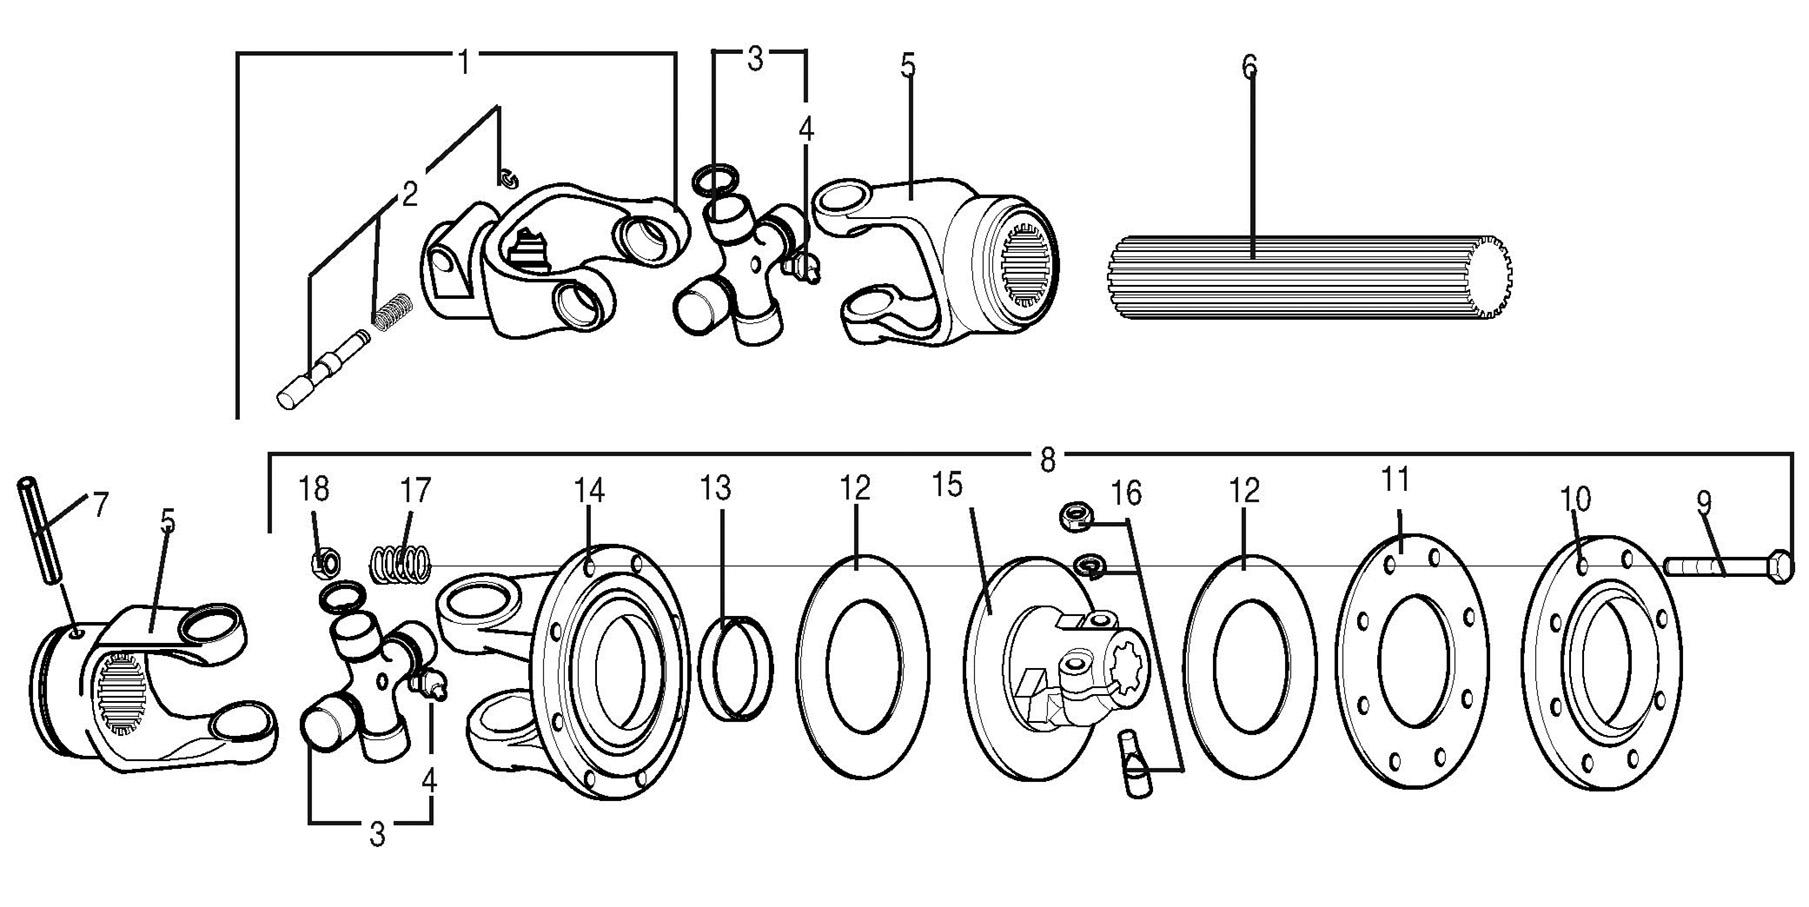 hight resolution of bush hog 2610 2615 12610 12615 s n s 12 00001 and above parts rh store germanbliss com brush hog tires brush hog tires